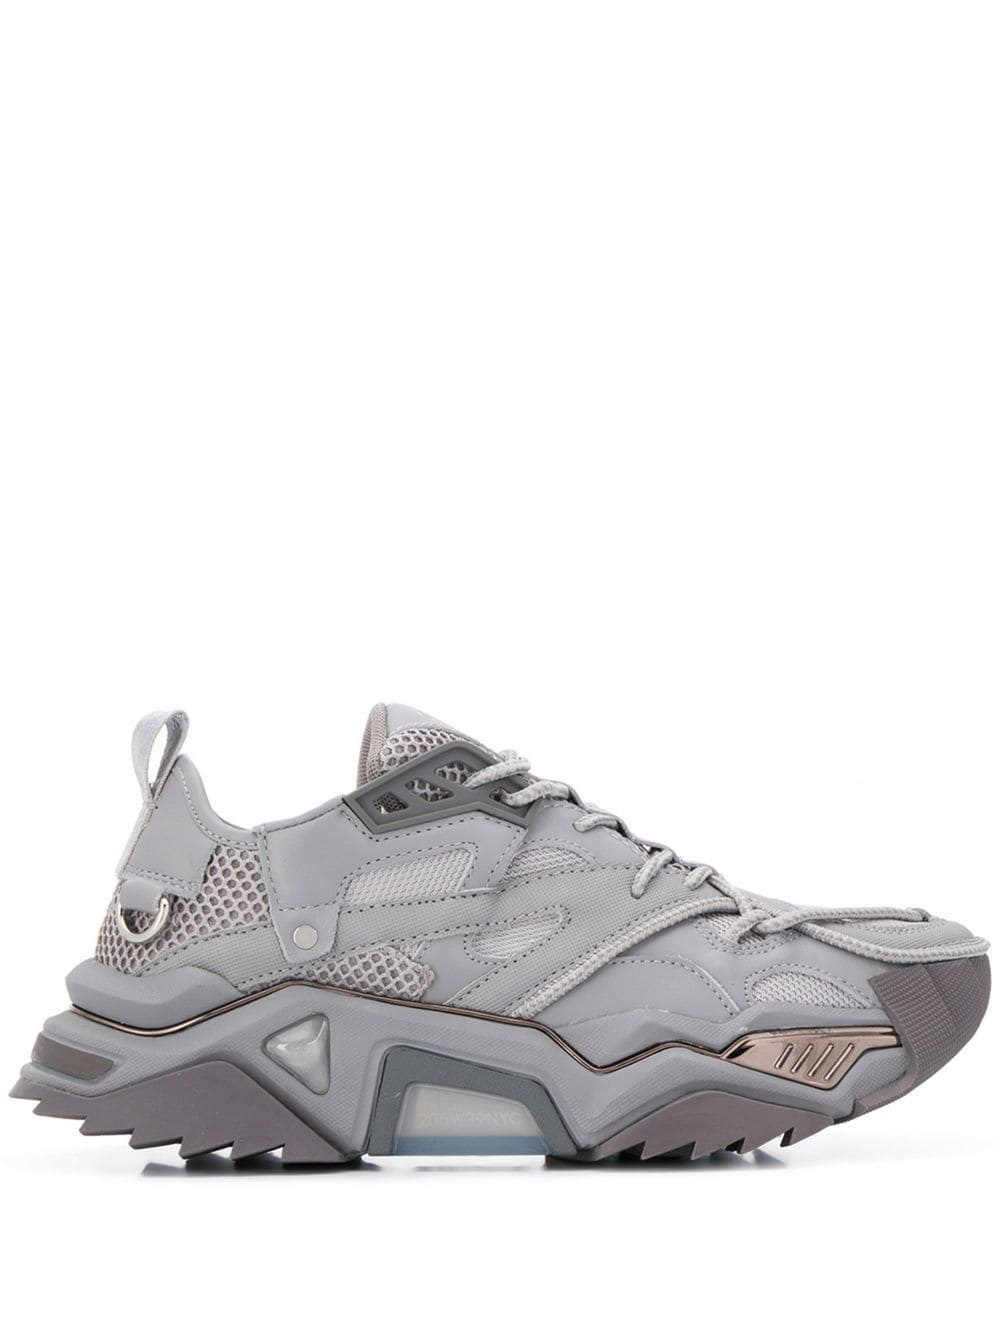 In Sneakers Calvin Strike 205w39nyc Grey Klein 205 Farfetch 2eEHYWD9I